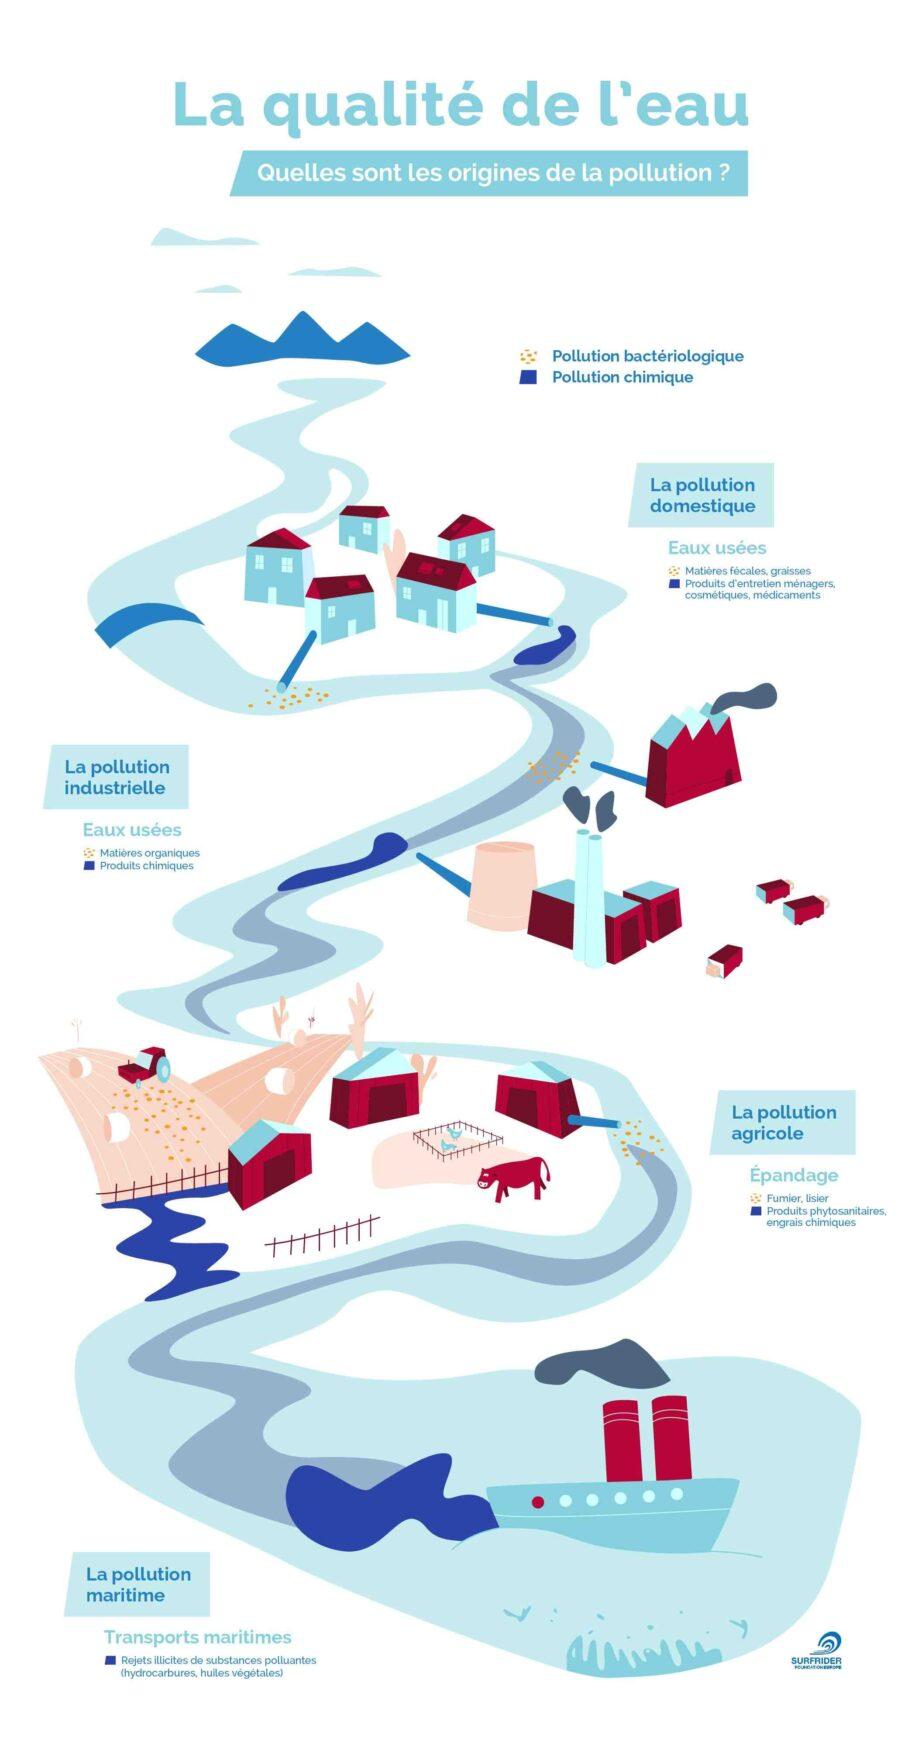 Quels sont les polluants de l'eau ?